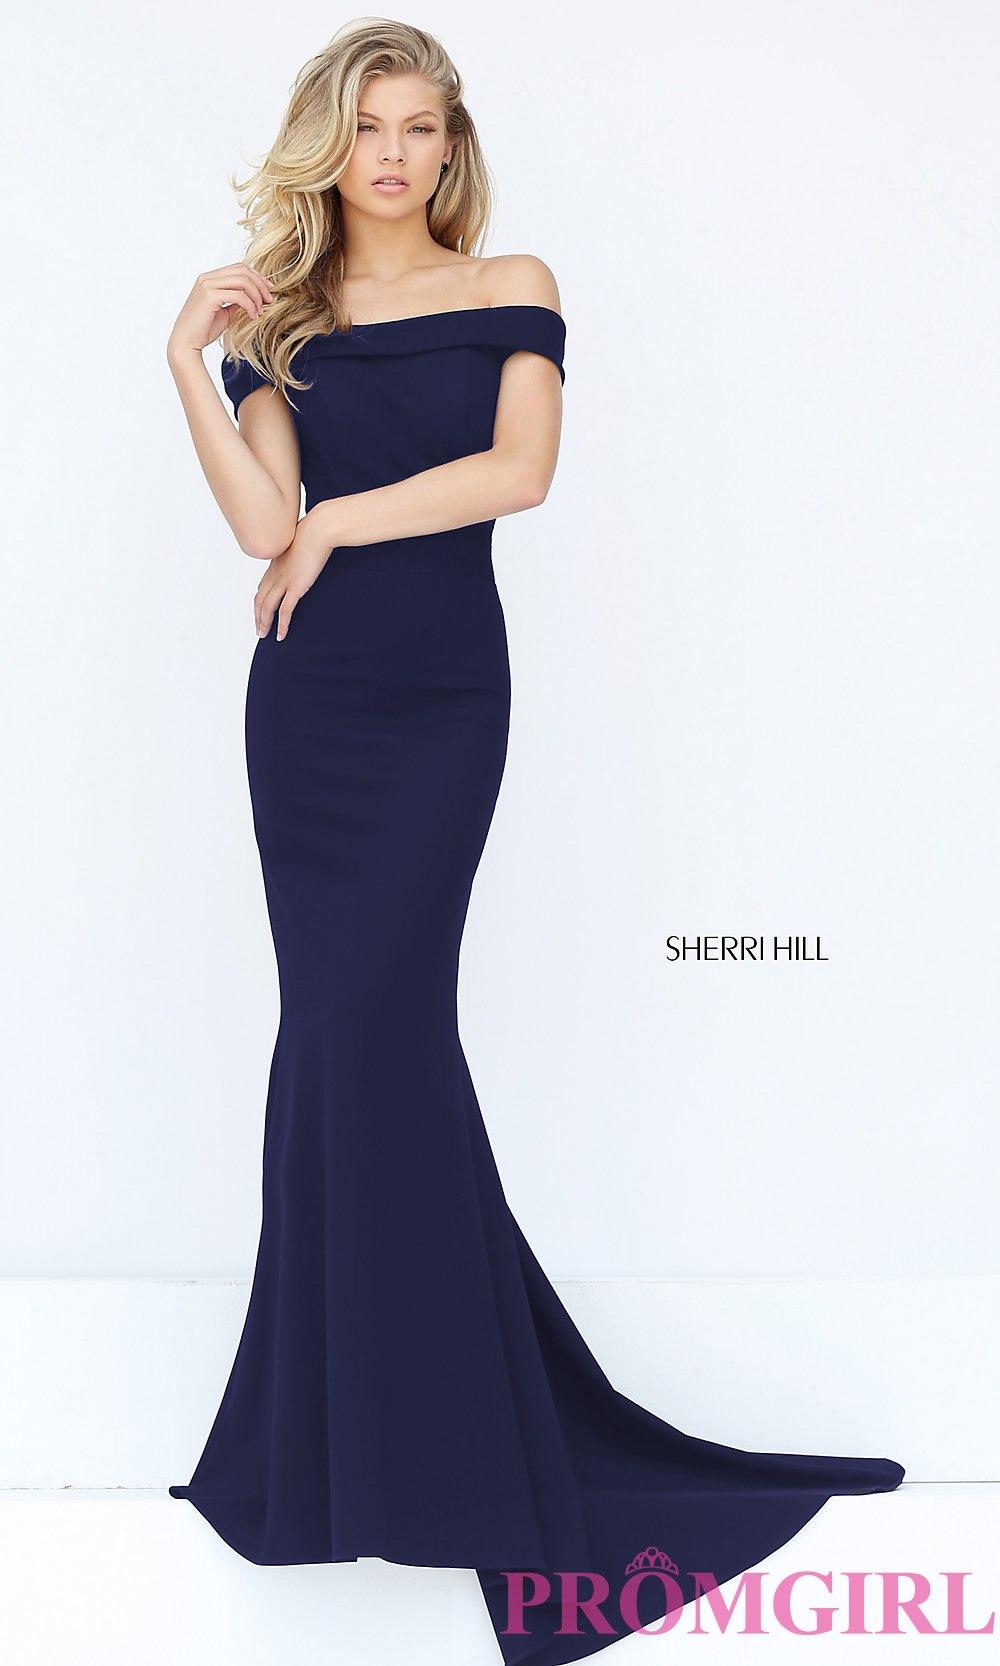 mermaid prom dresses loved! yhlkuoj